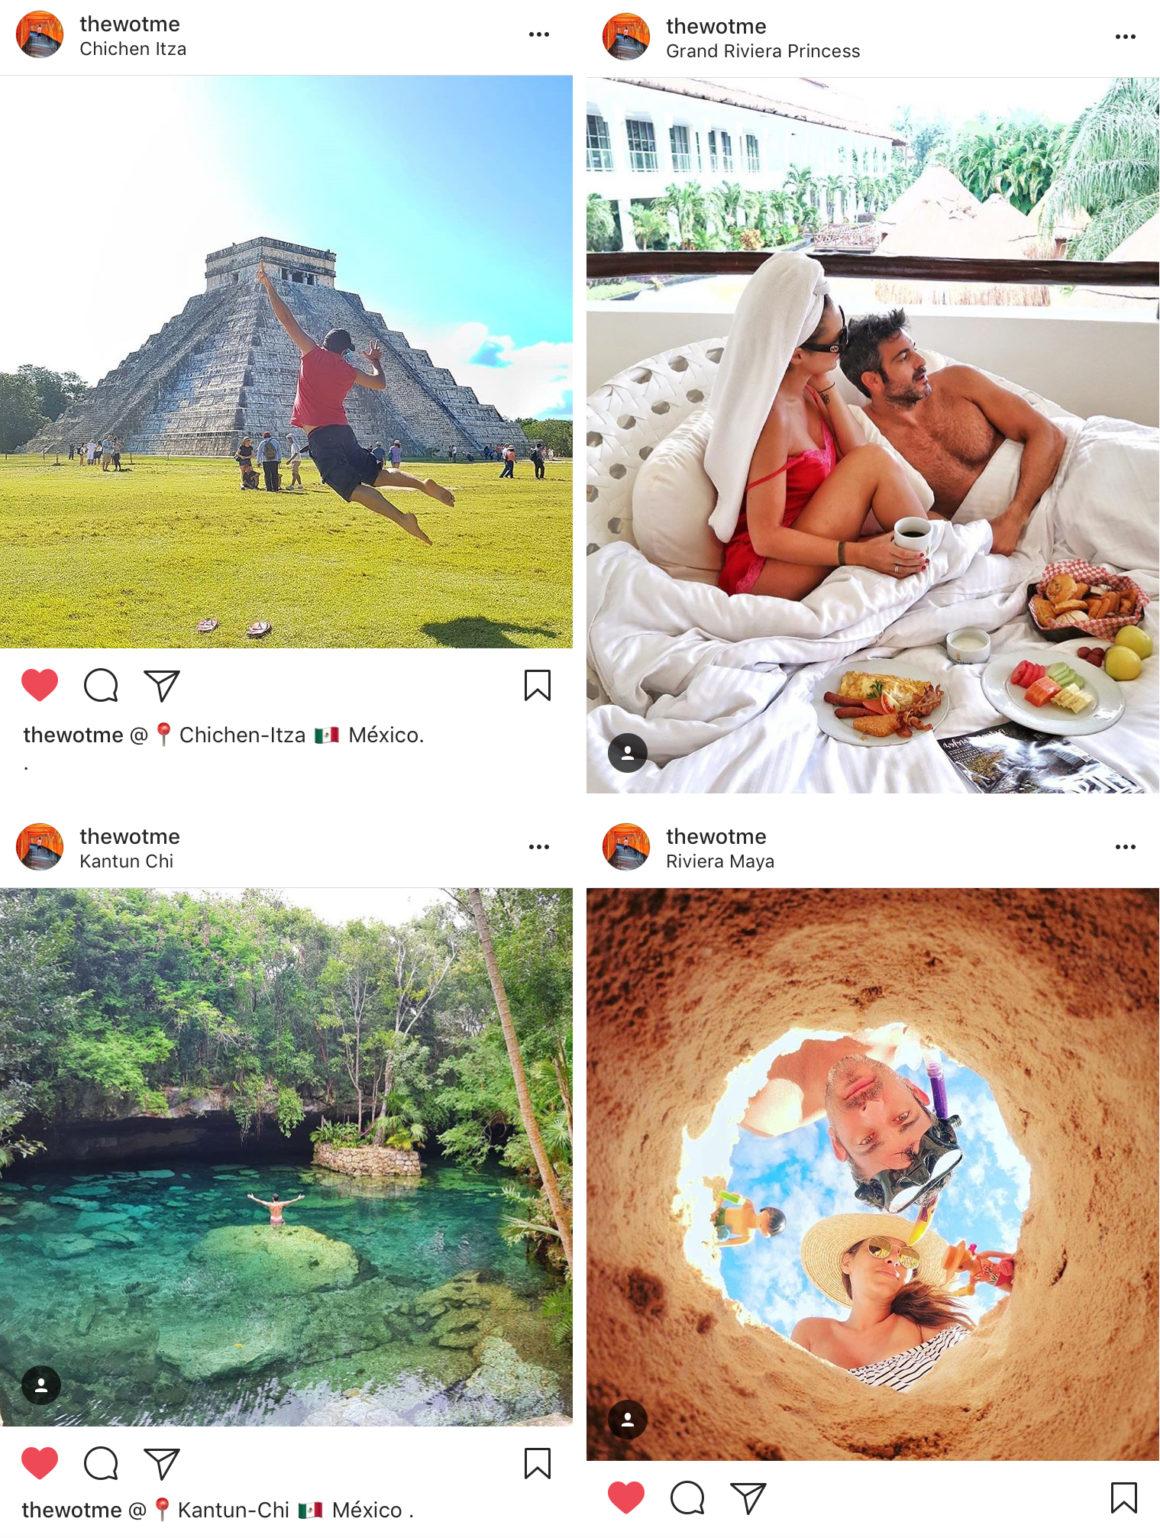 memoria de viajes 2017 - MEXICO 1160x1538 - Memoria de Viajes 2017